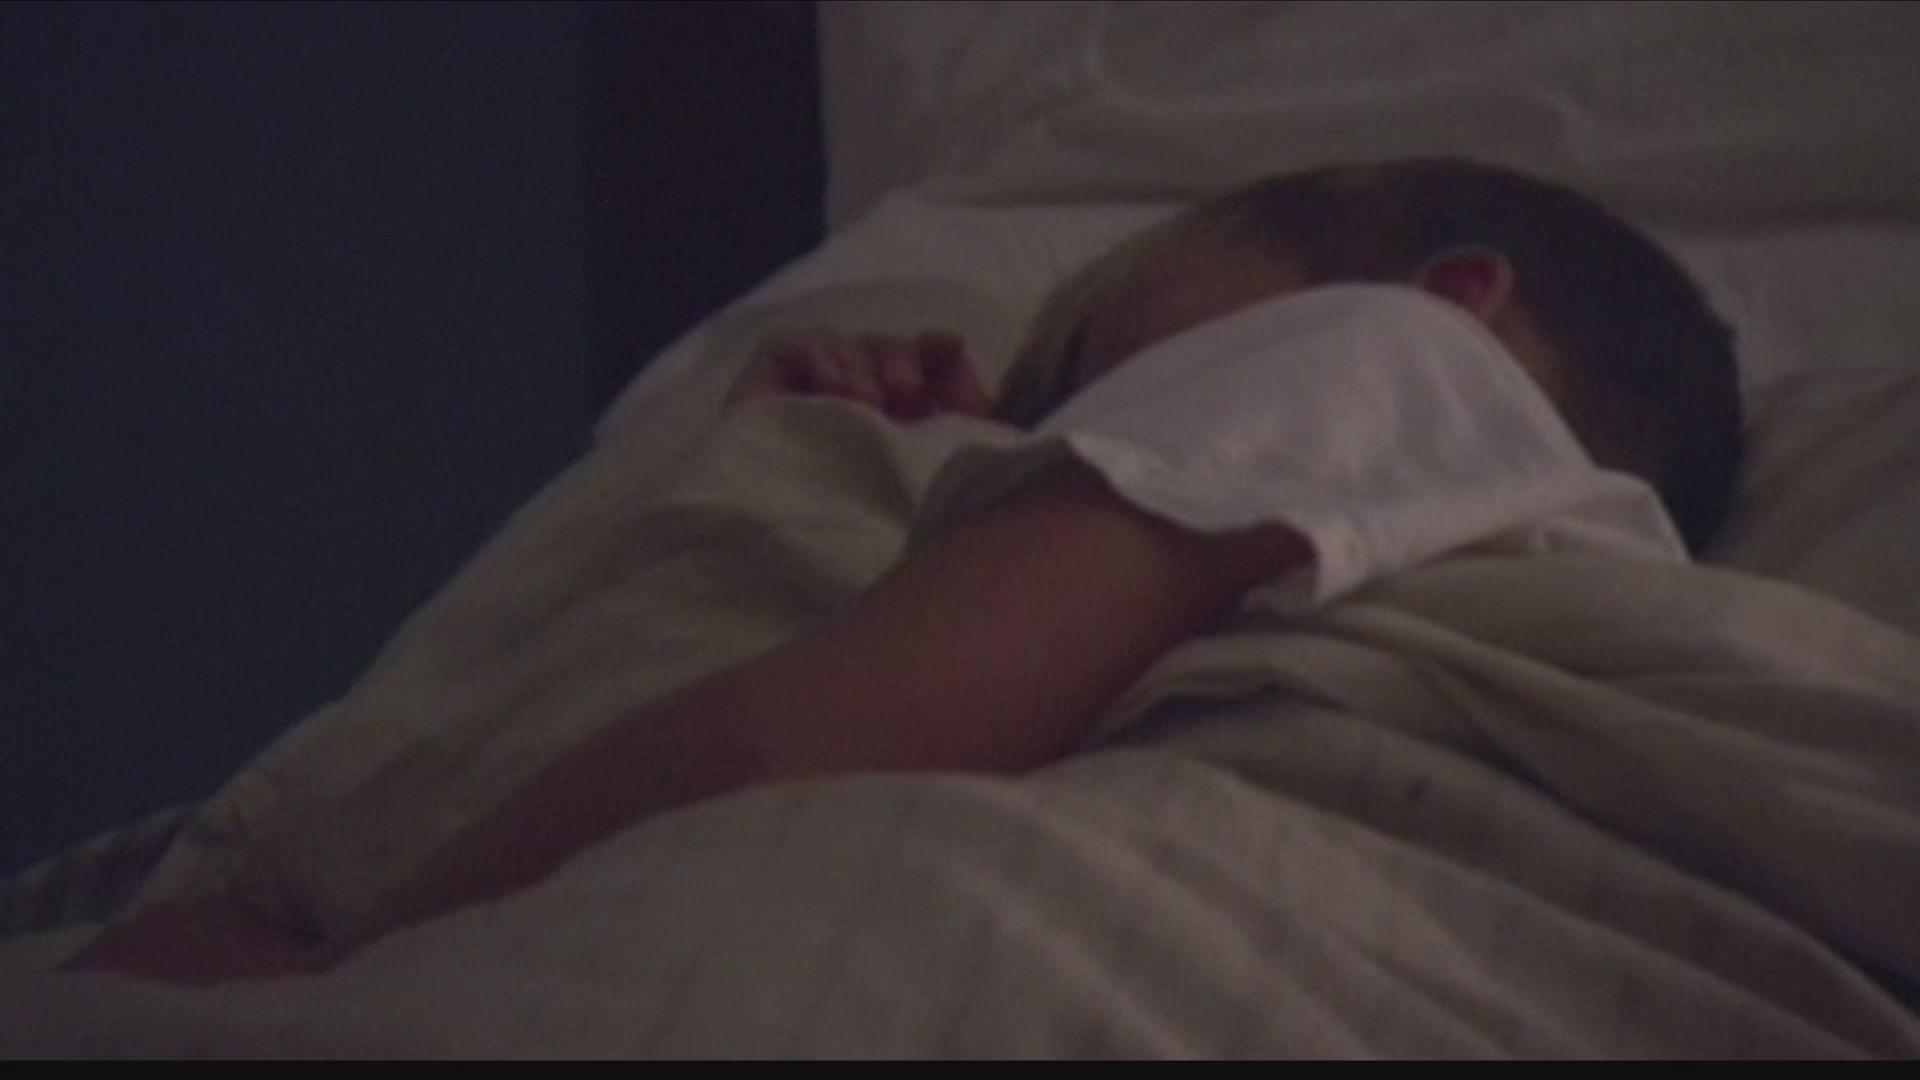 The Bedtime Hoops